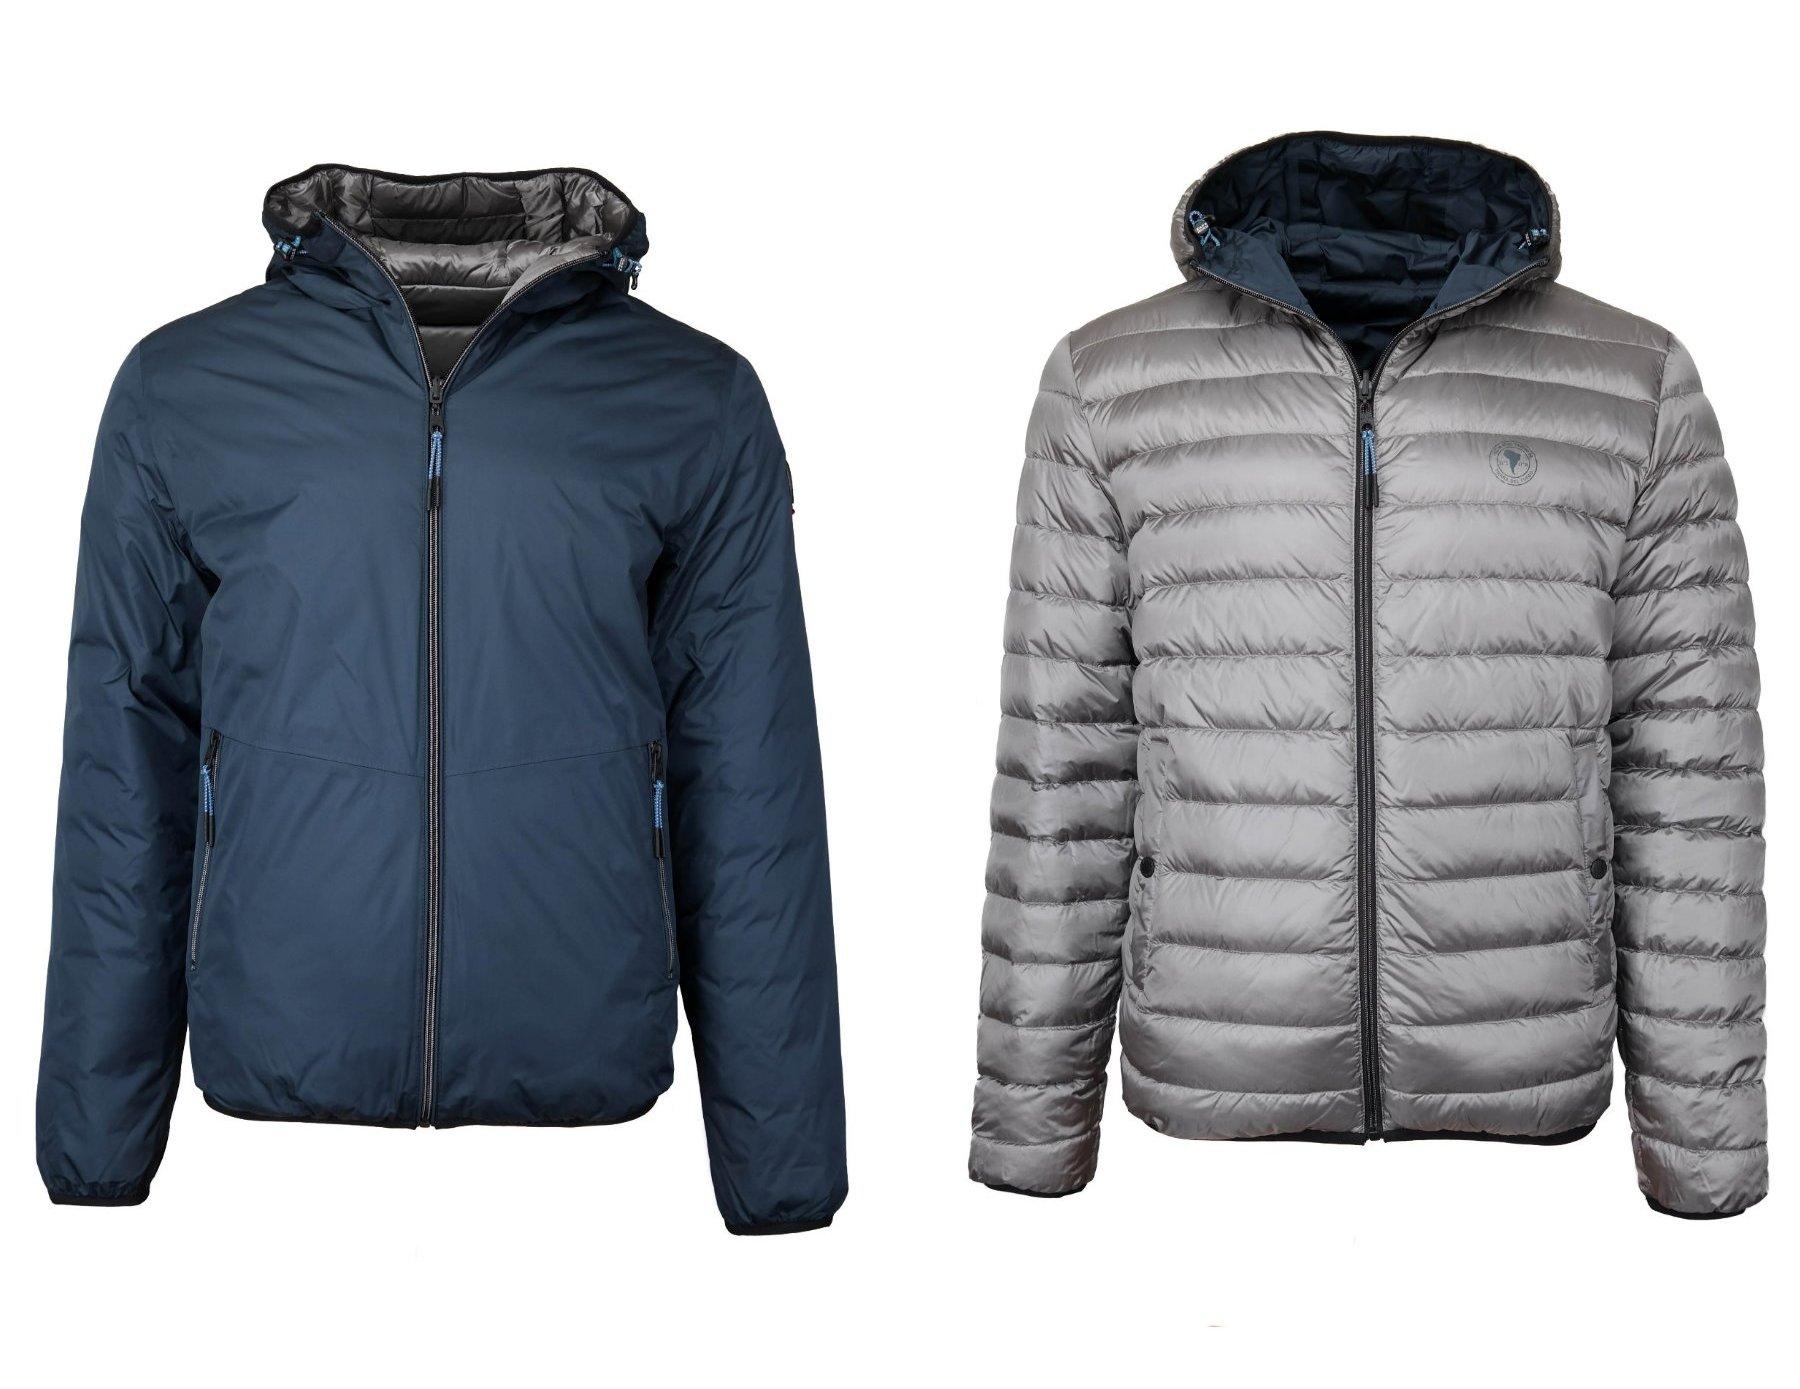 online store 0e41e f2d99 CAPE HORN FUERTE Herren Daunenjacke, Size: 52 - to - 60 / Wendbar    Fashion-House